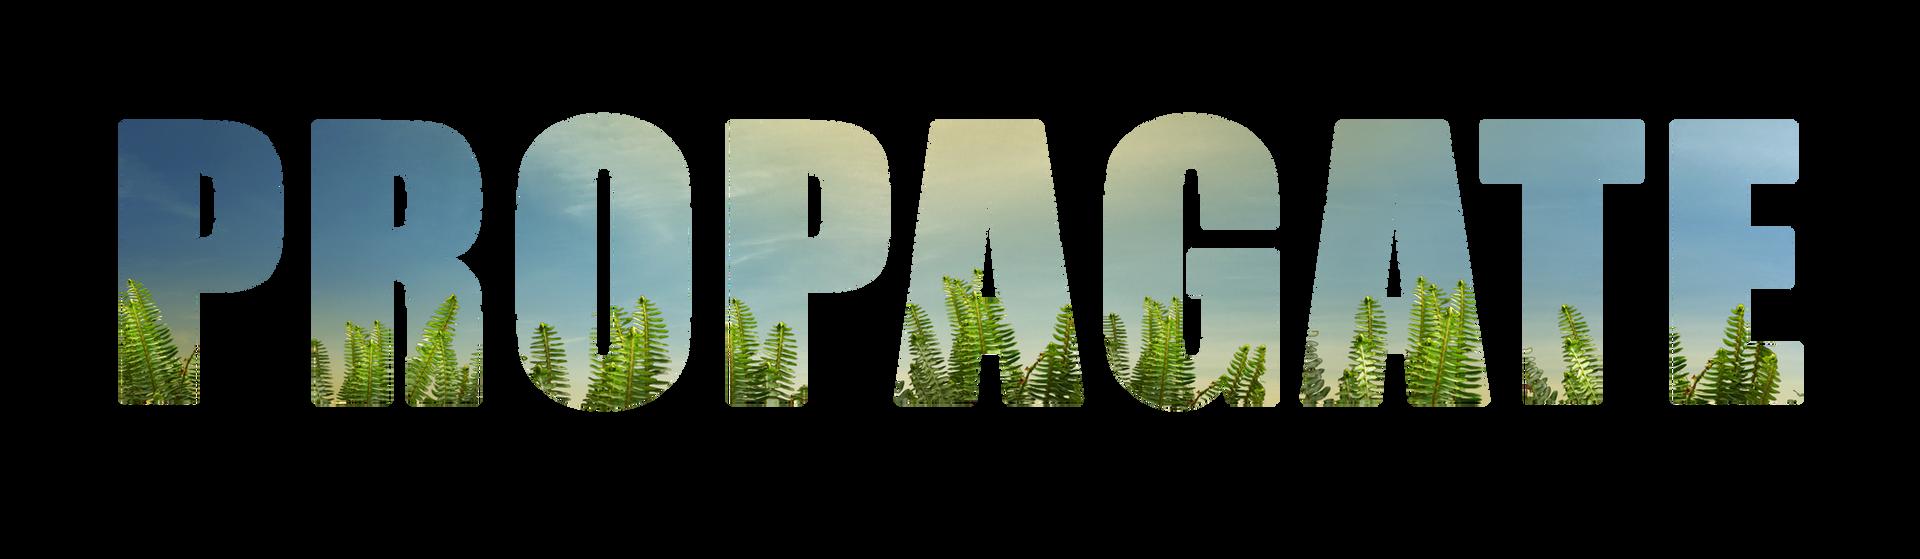 Propagate.png